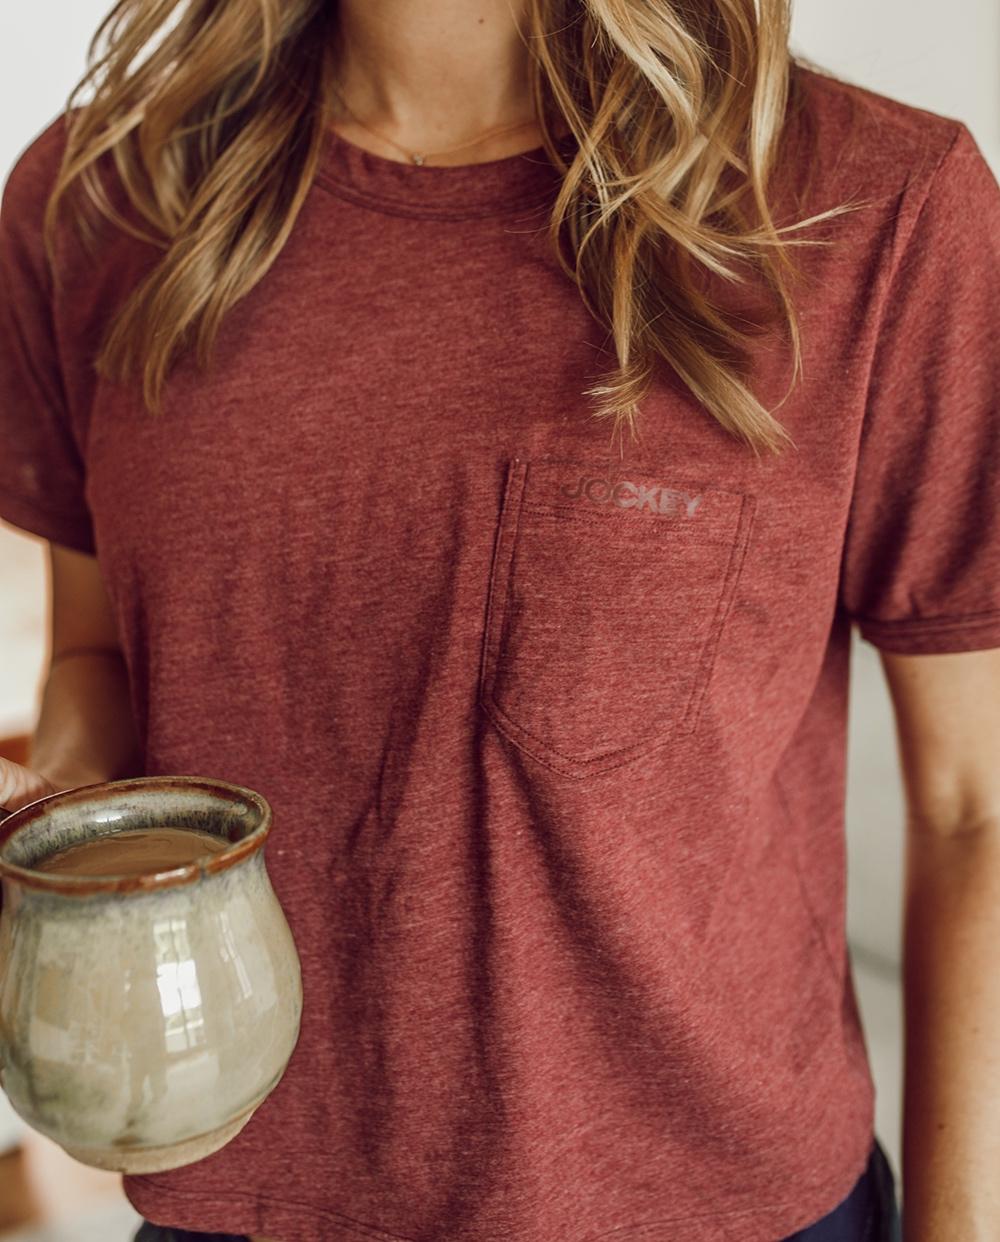 livvyland-blog-olivia-watson-austin-texas-lifestyle-blogger-jockey-loungewear-6